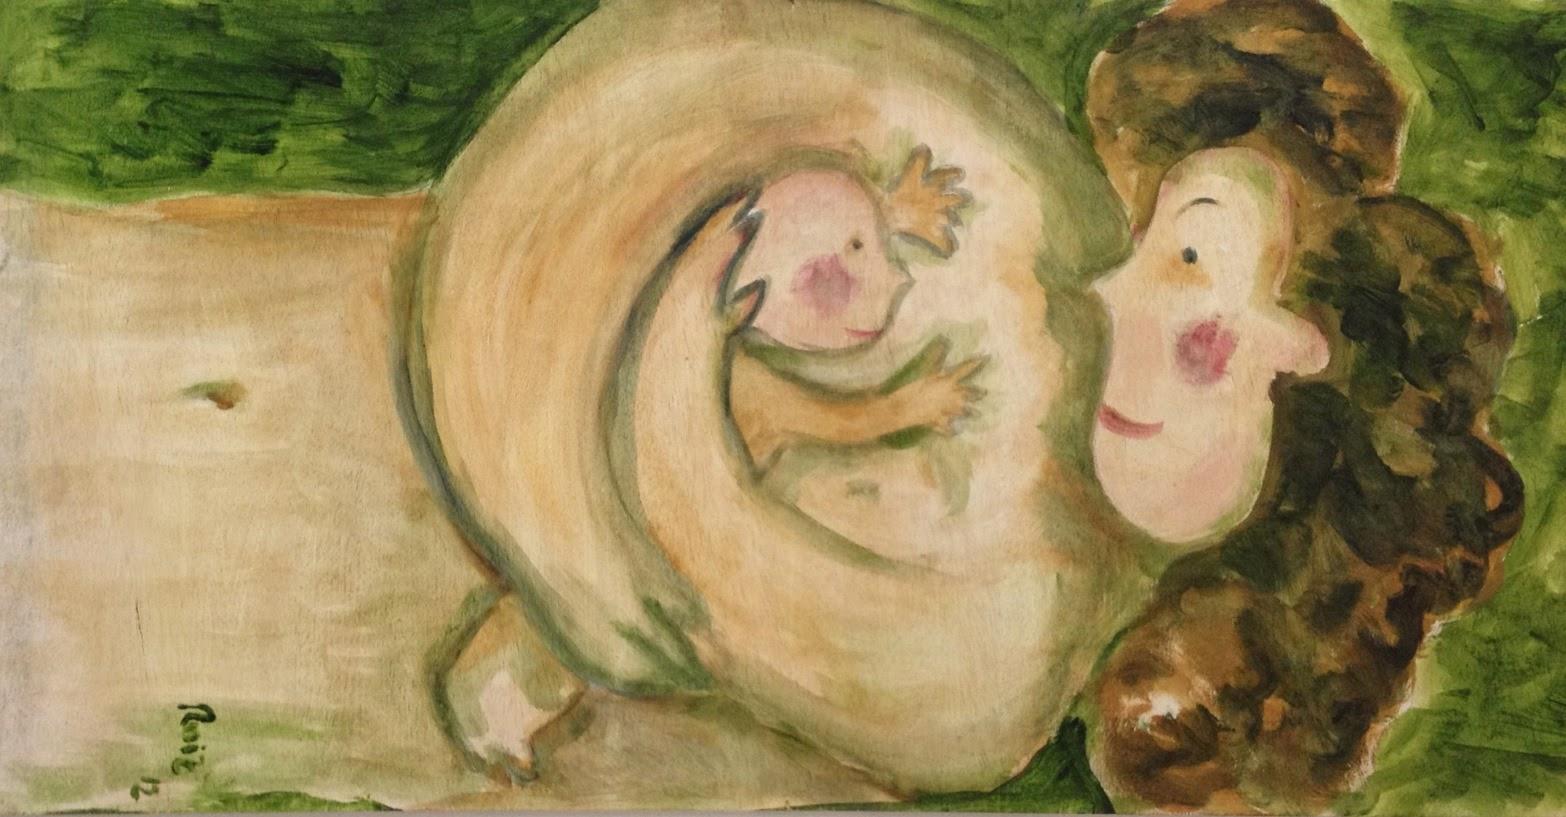 Pintura sobre tabla (100 x 50 cm) de Esther Ruiz Chercoles, pediatra y artista